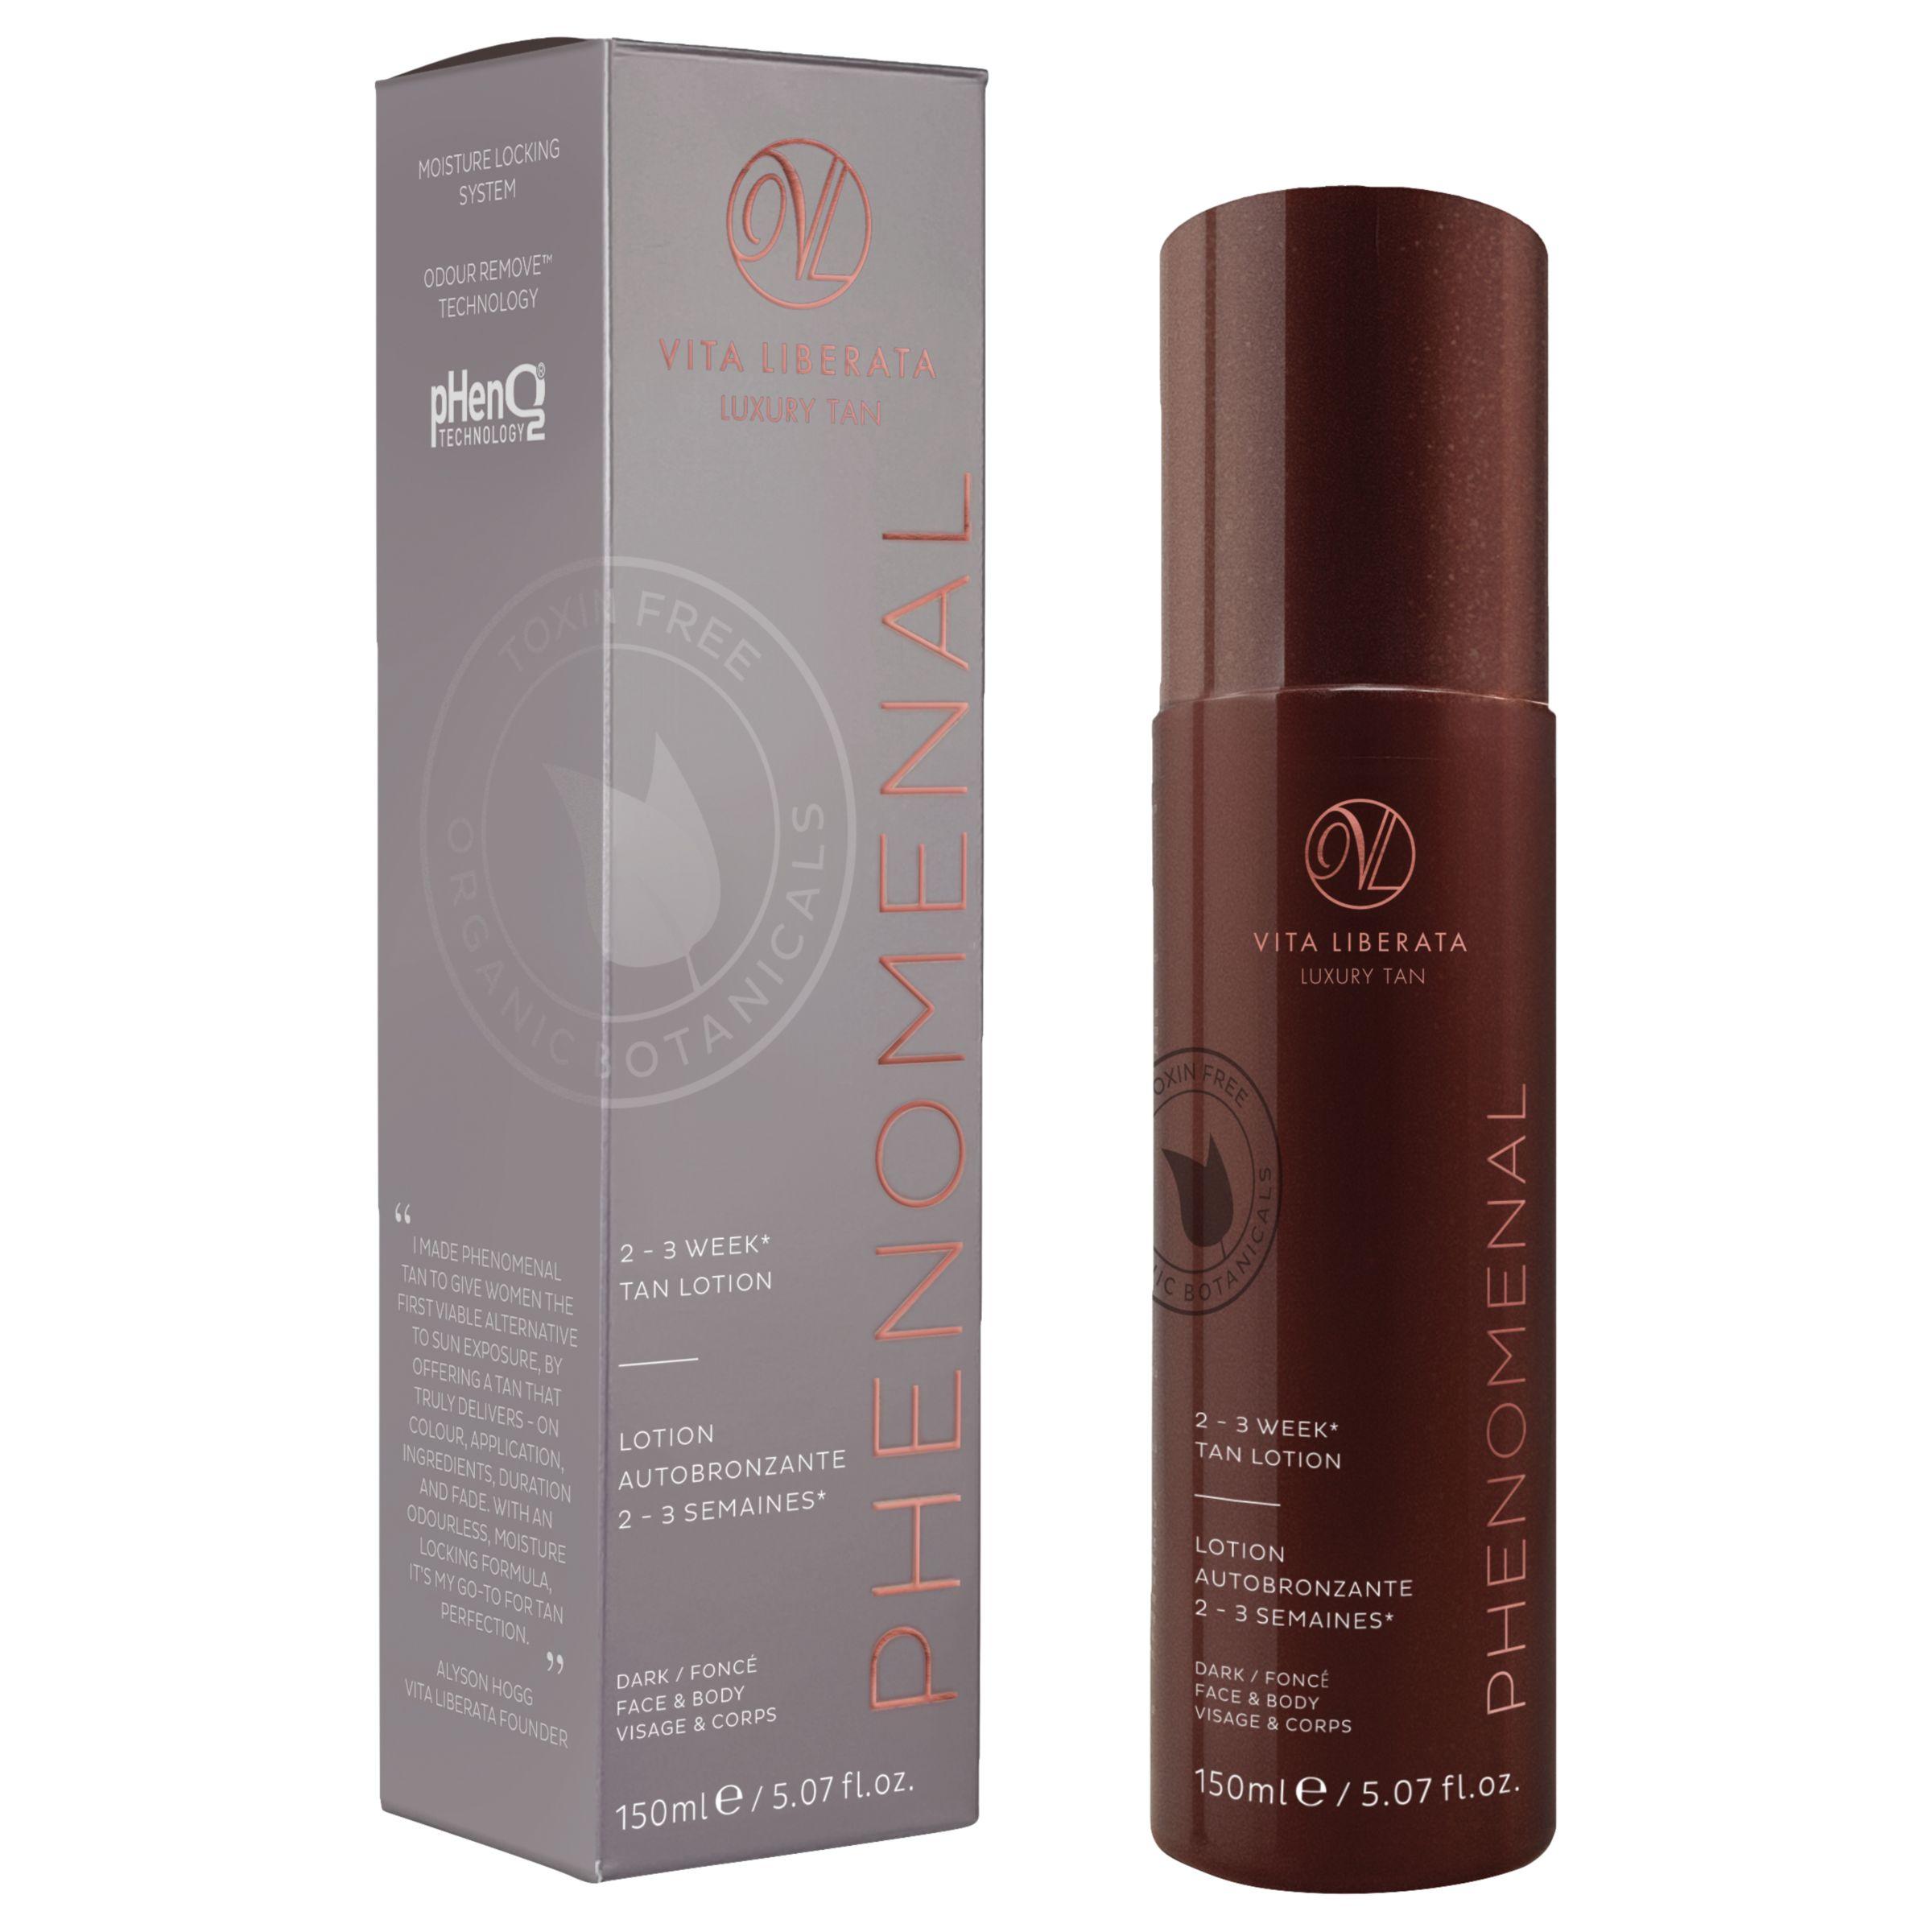 Vita Liberata Vita Liberata pHenomenal 2-3 Week Face & Body Tan Lotion Dark, 150ml